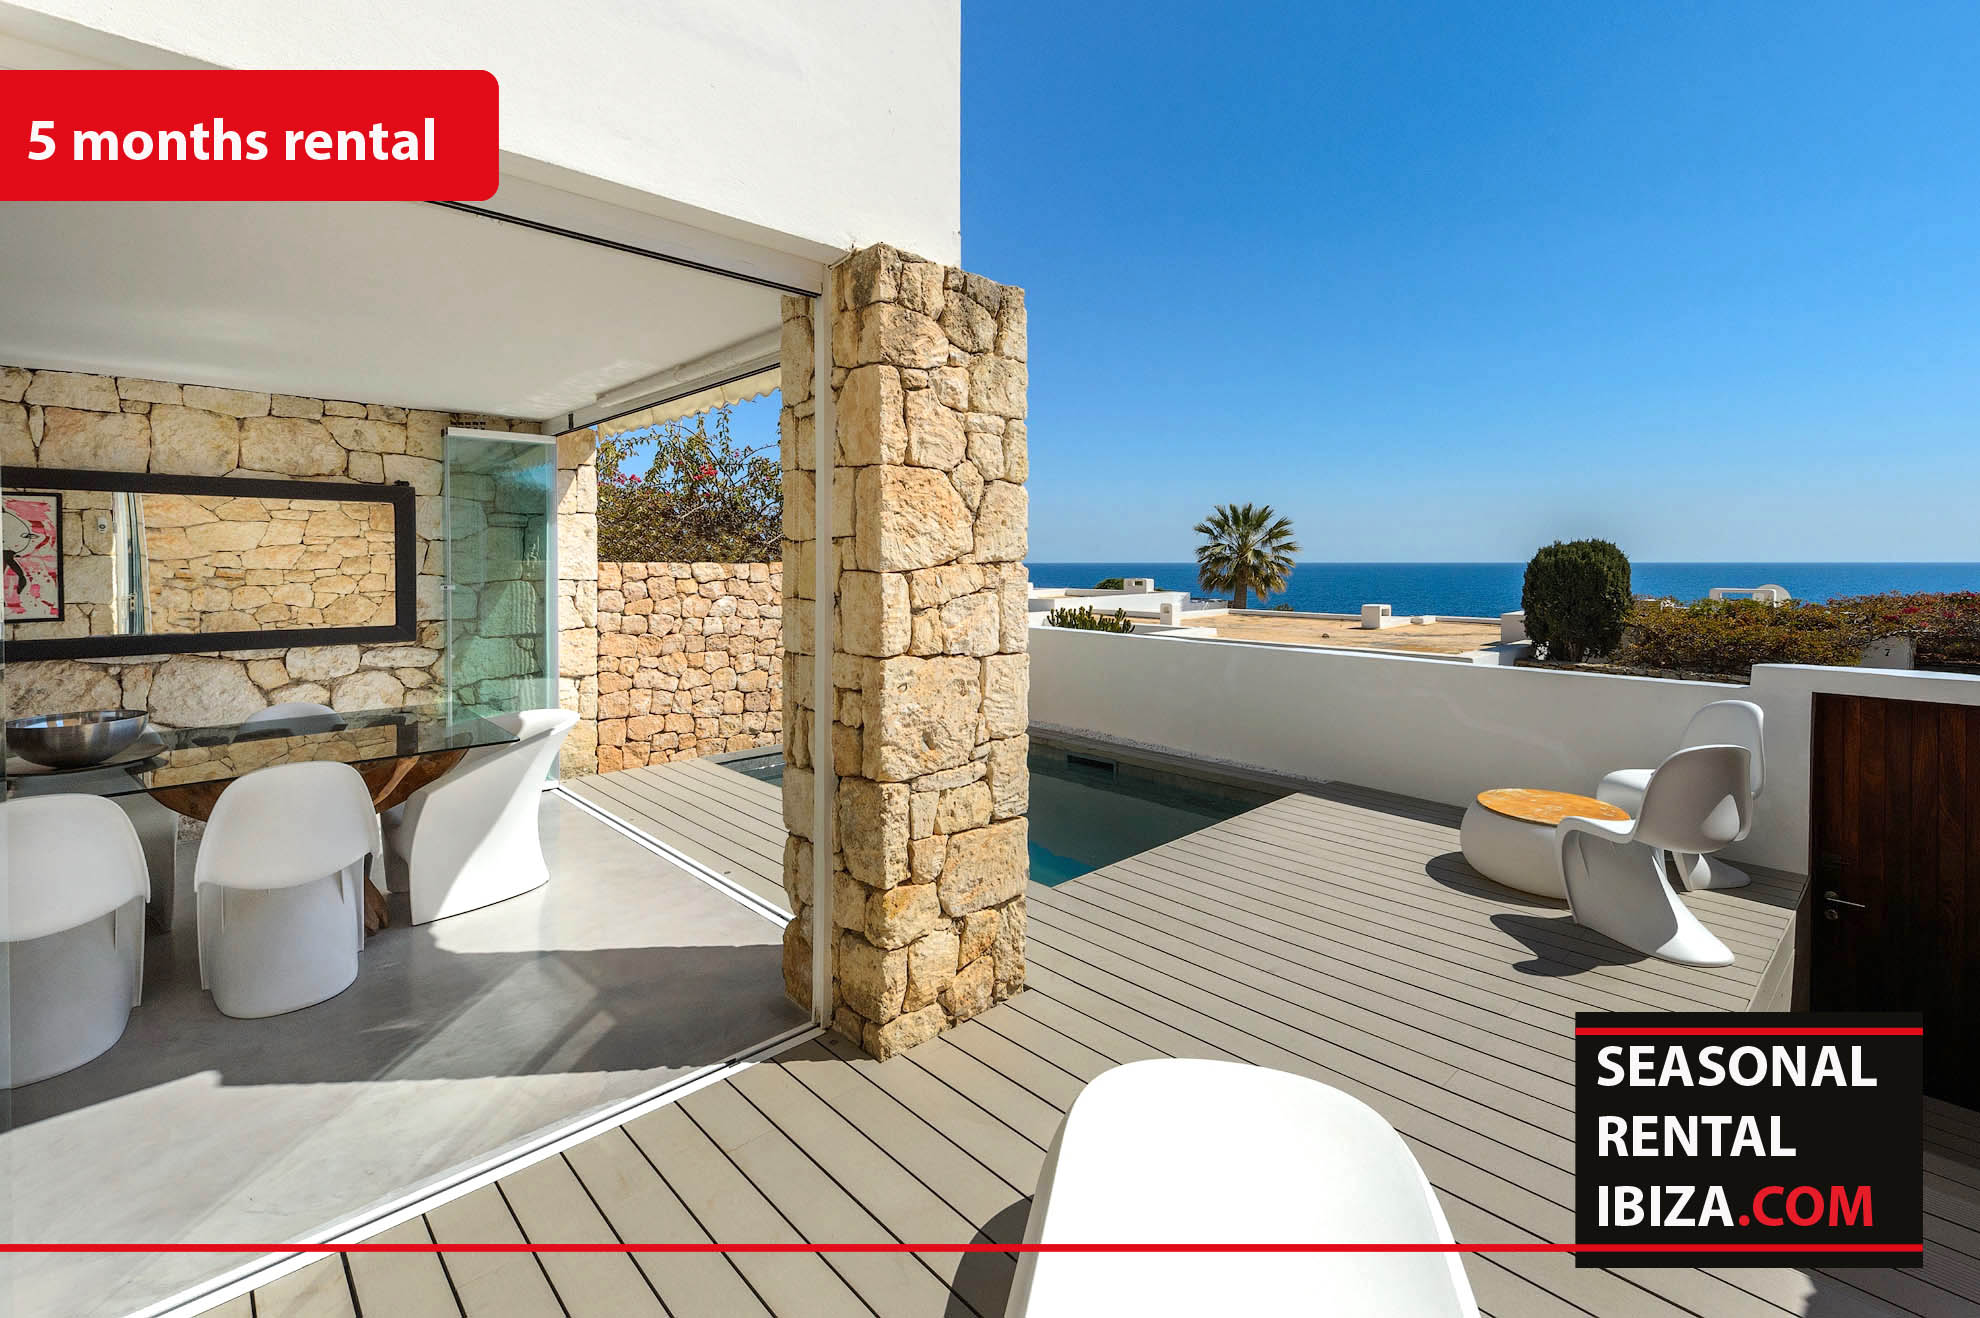 Seasonal rental Ibiza – Roca llisa Adosada